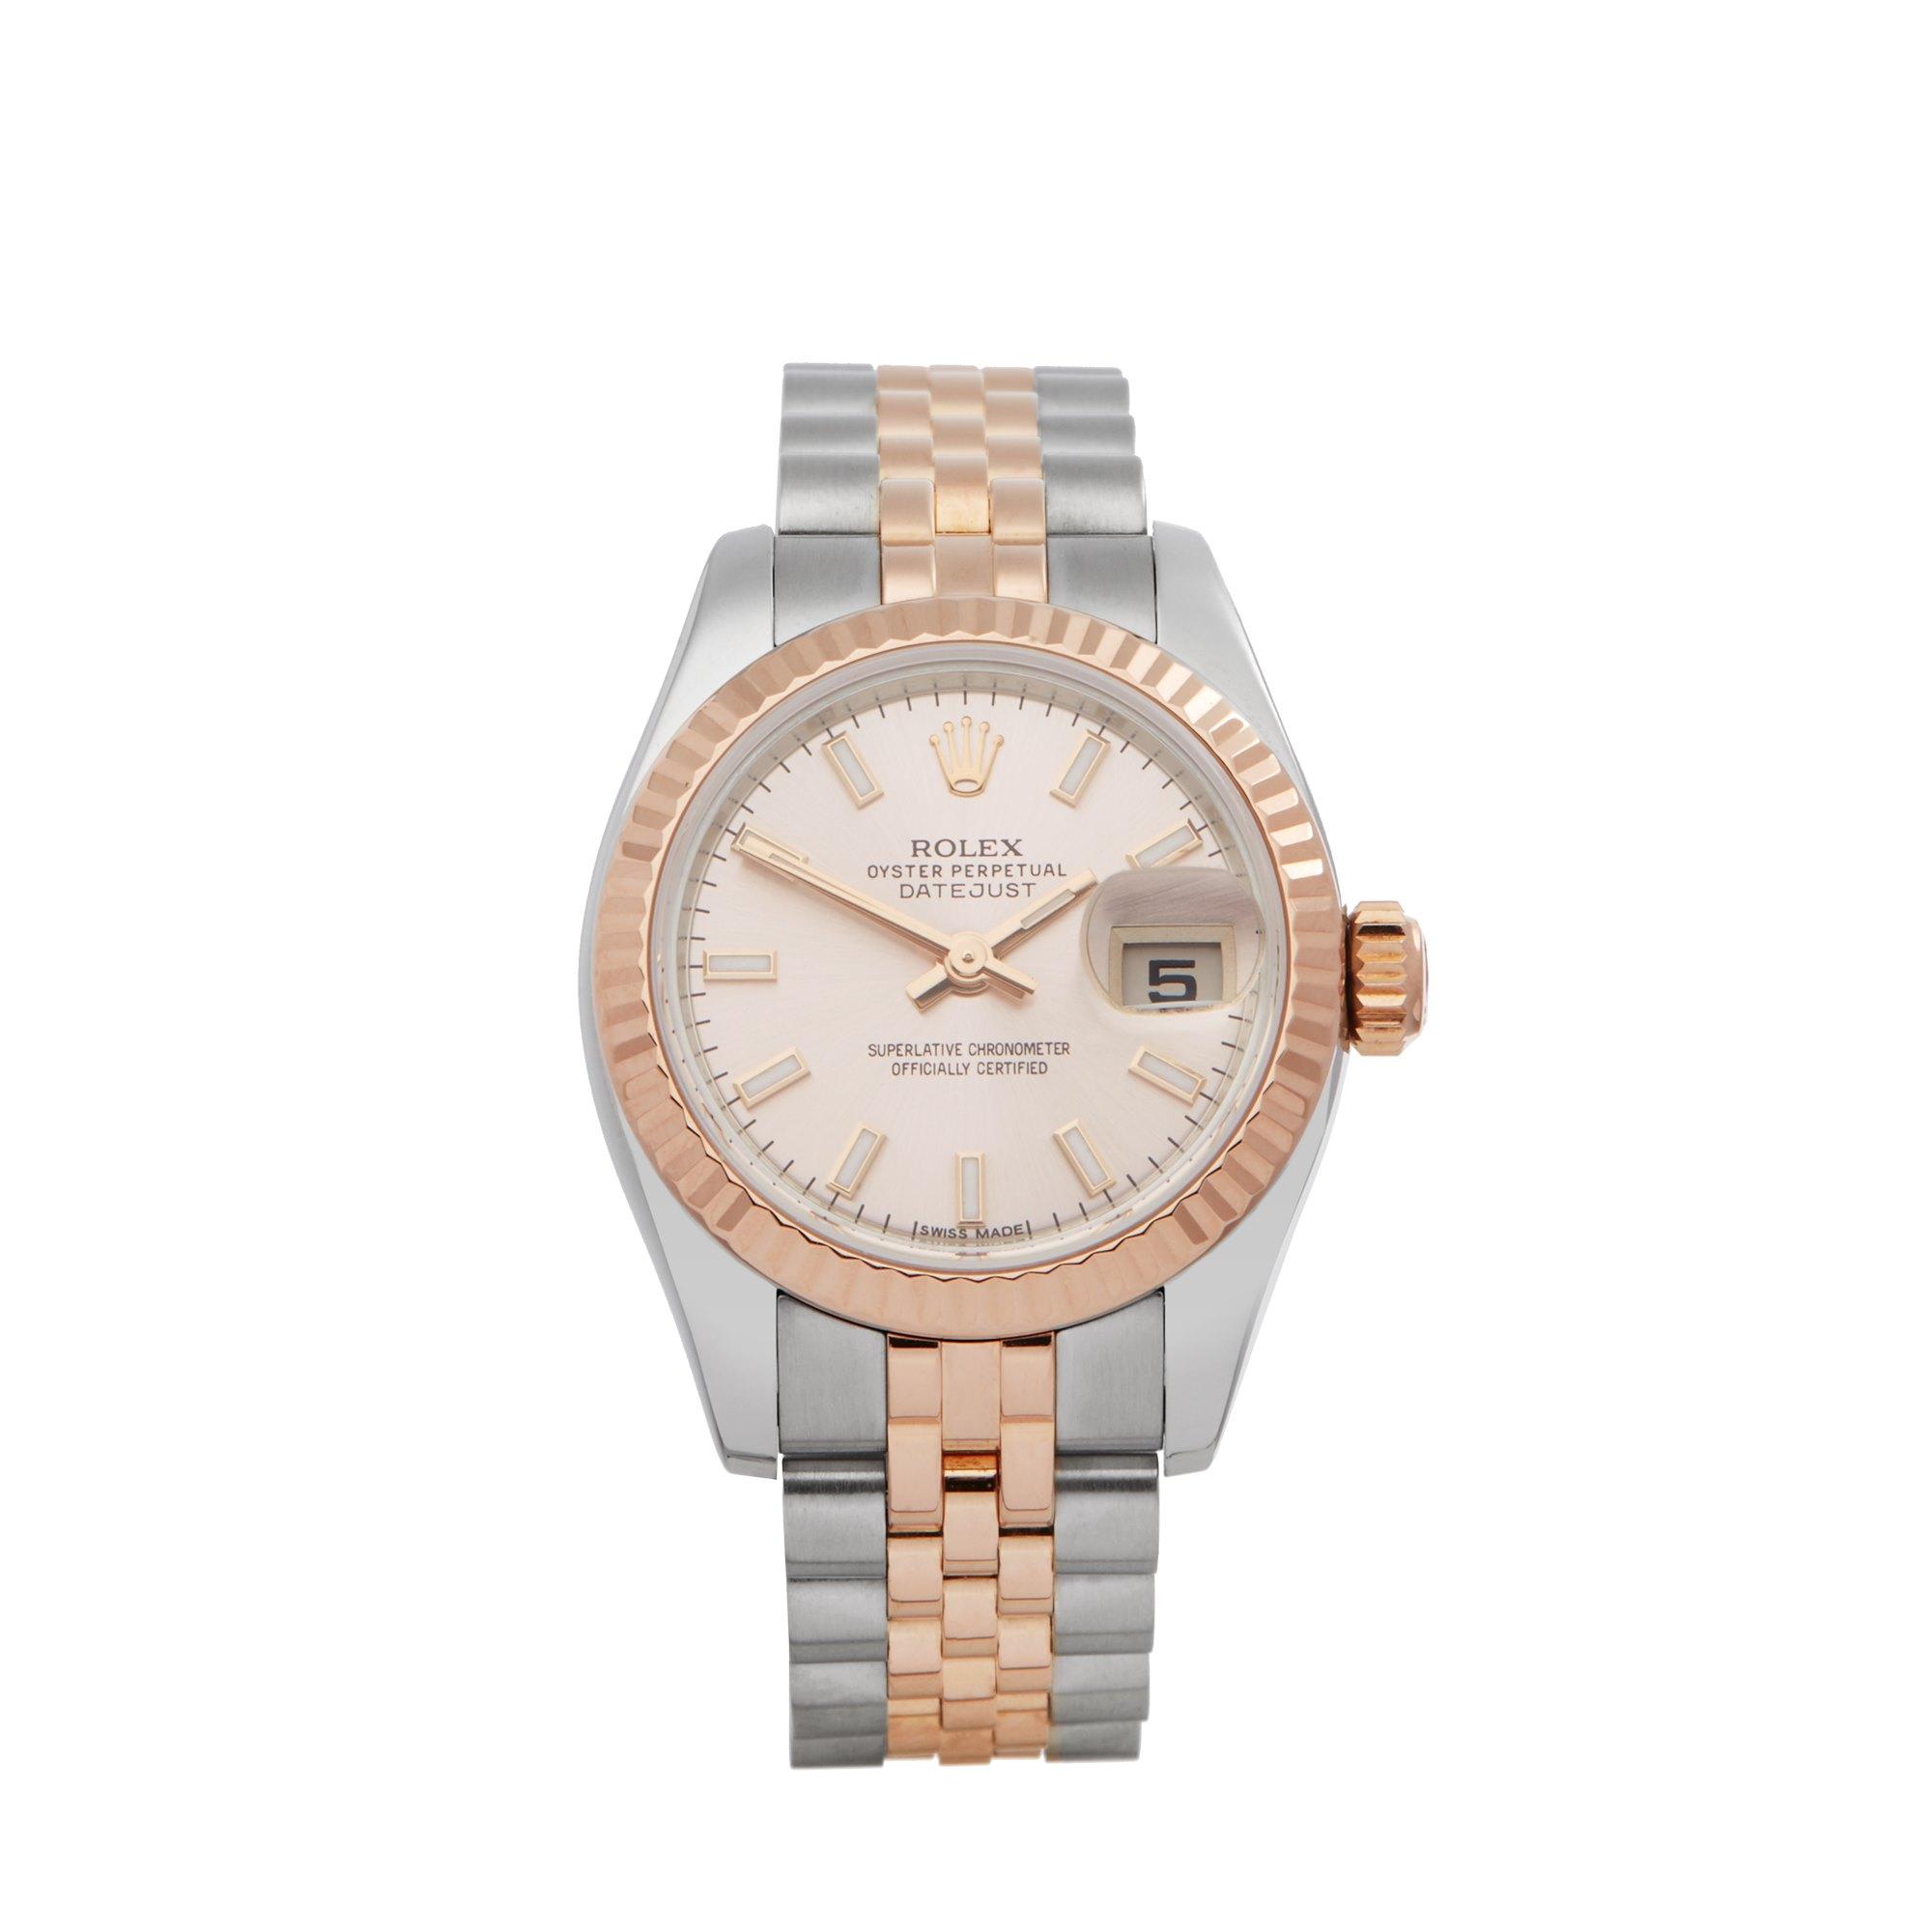 Rolex Datejust 26 179171 Ladies Rose Gold & Stainless Steel Watch